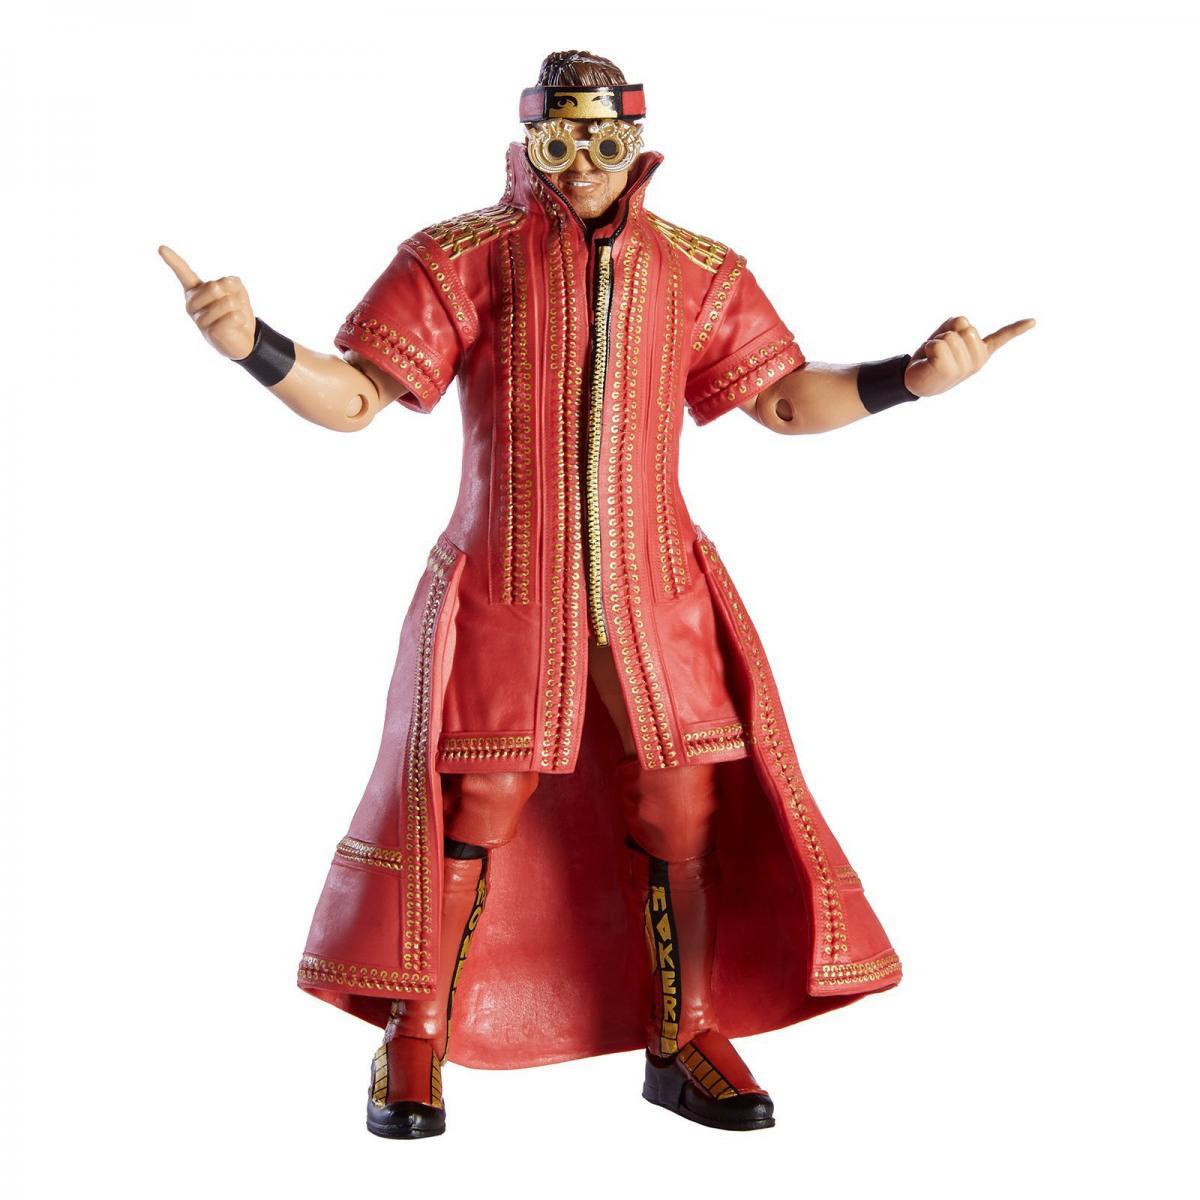 Image of WWE Wrestling Elite Series 69 - The Miz Action Figure